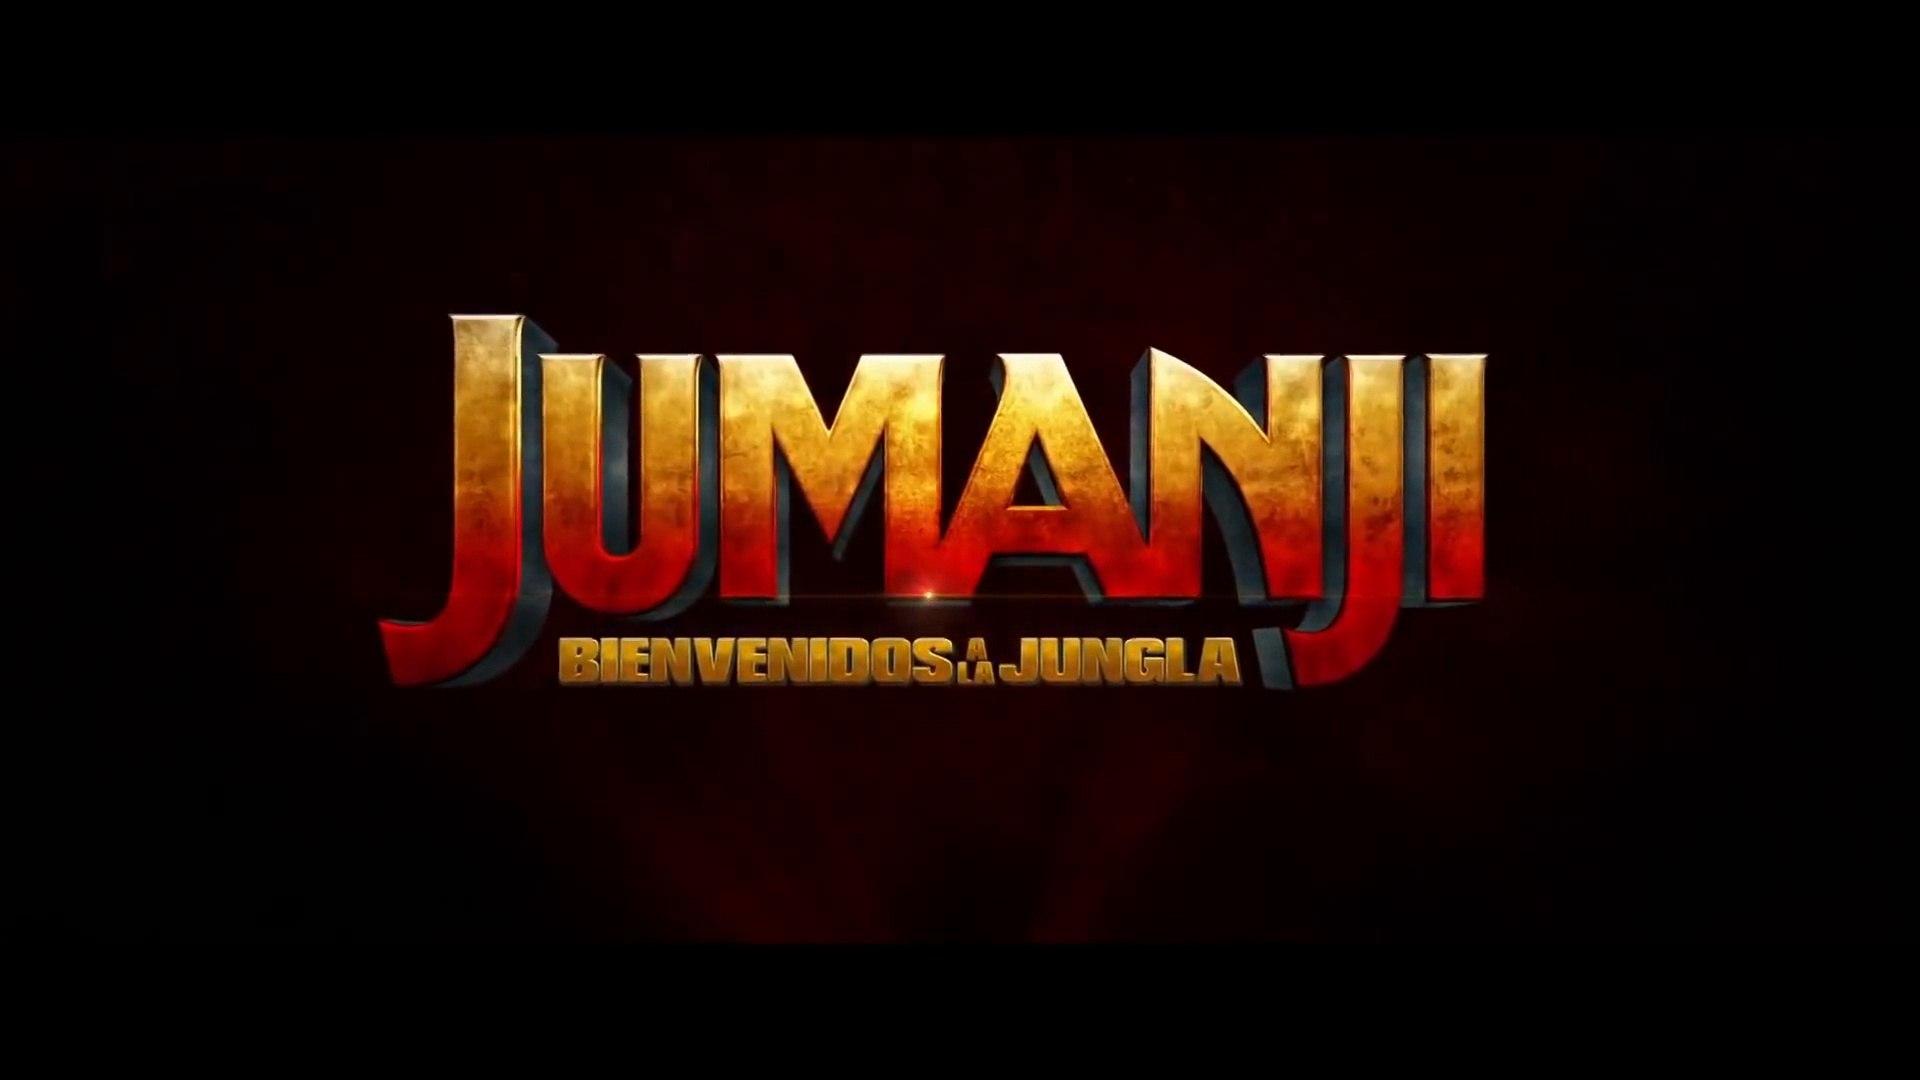 JUMANJI: Bienvenidos a la jungla (2017) Trailer